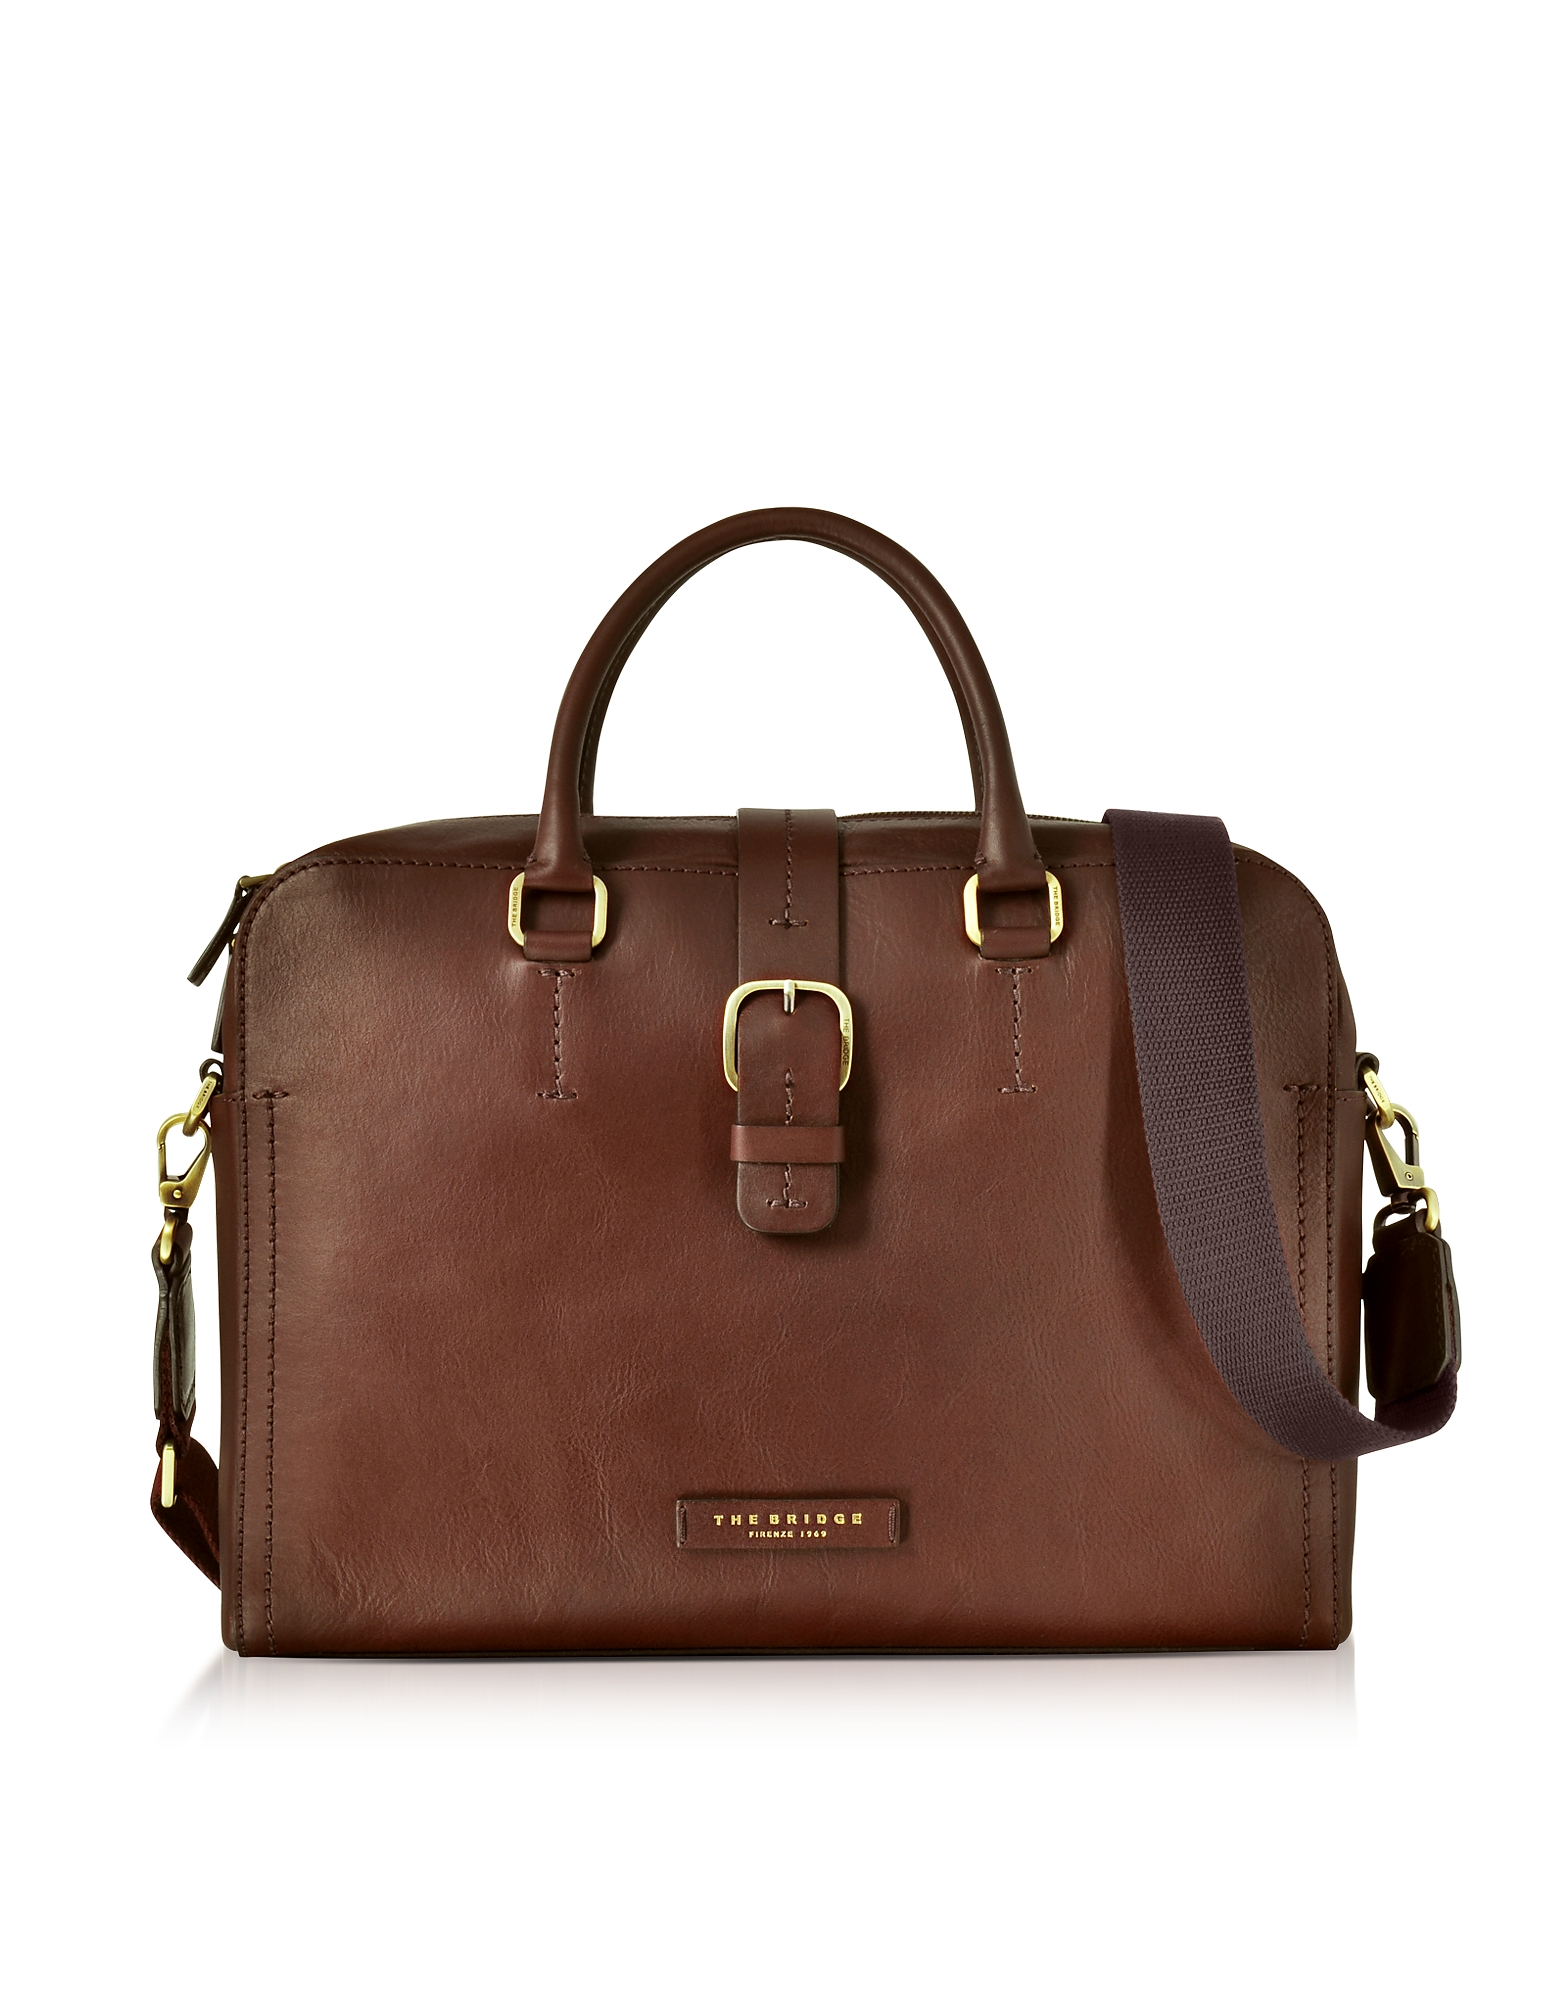 Dark Brown Leather Double Handle Briefcase w/Detachable Shoulder Strap